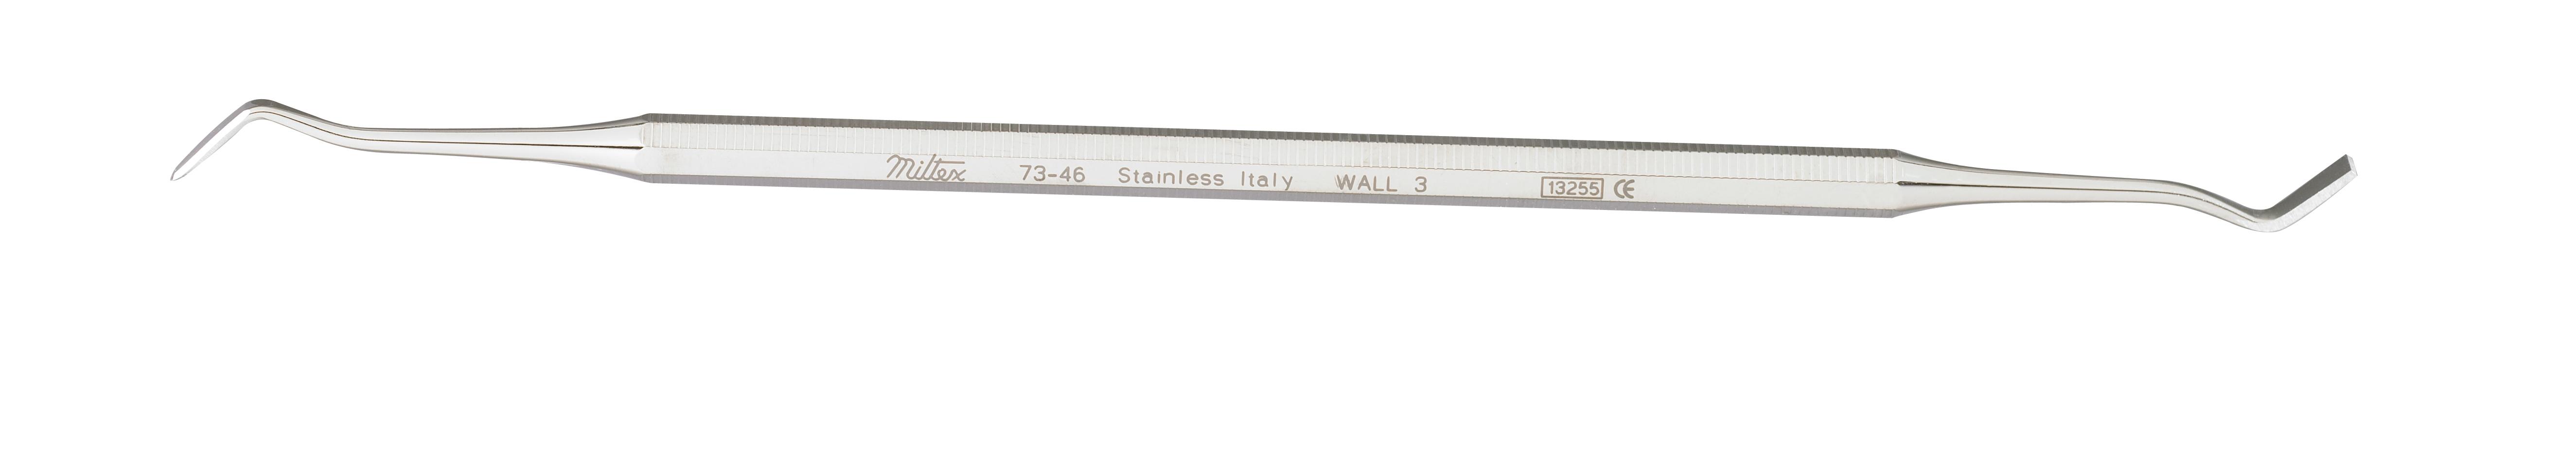 no-3-wall-carver-73-46-miltex.jpg